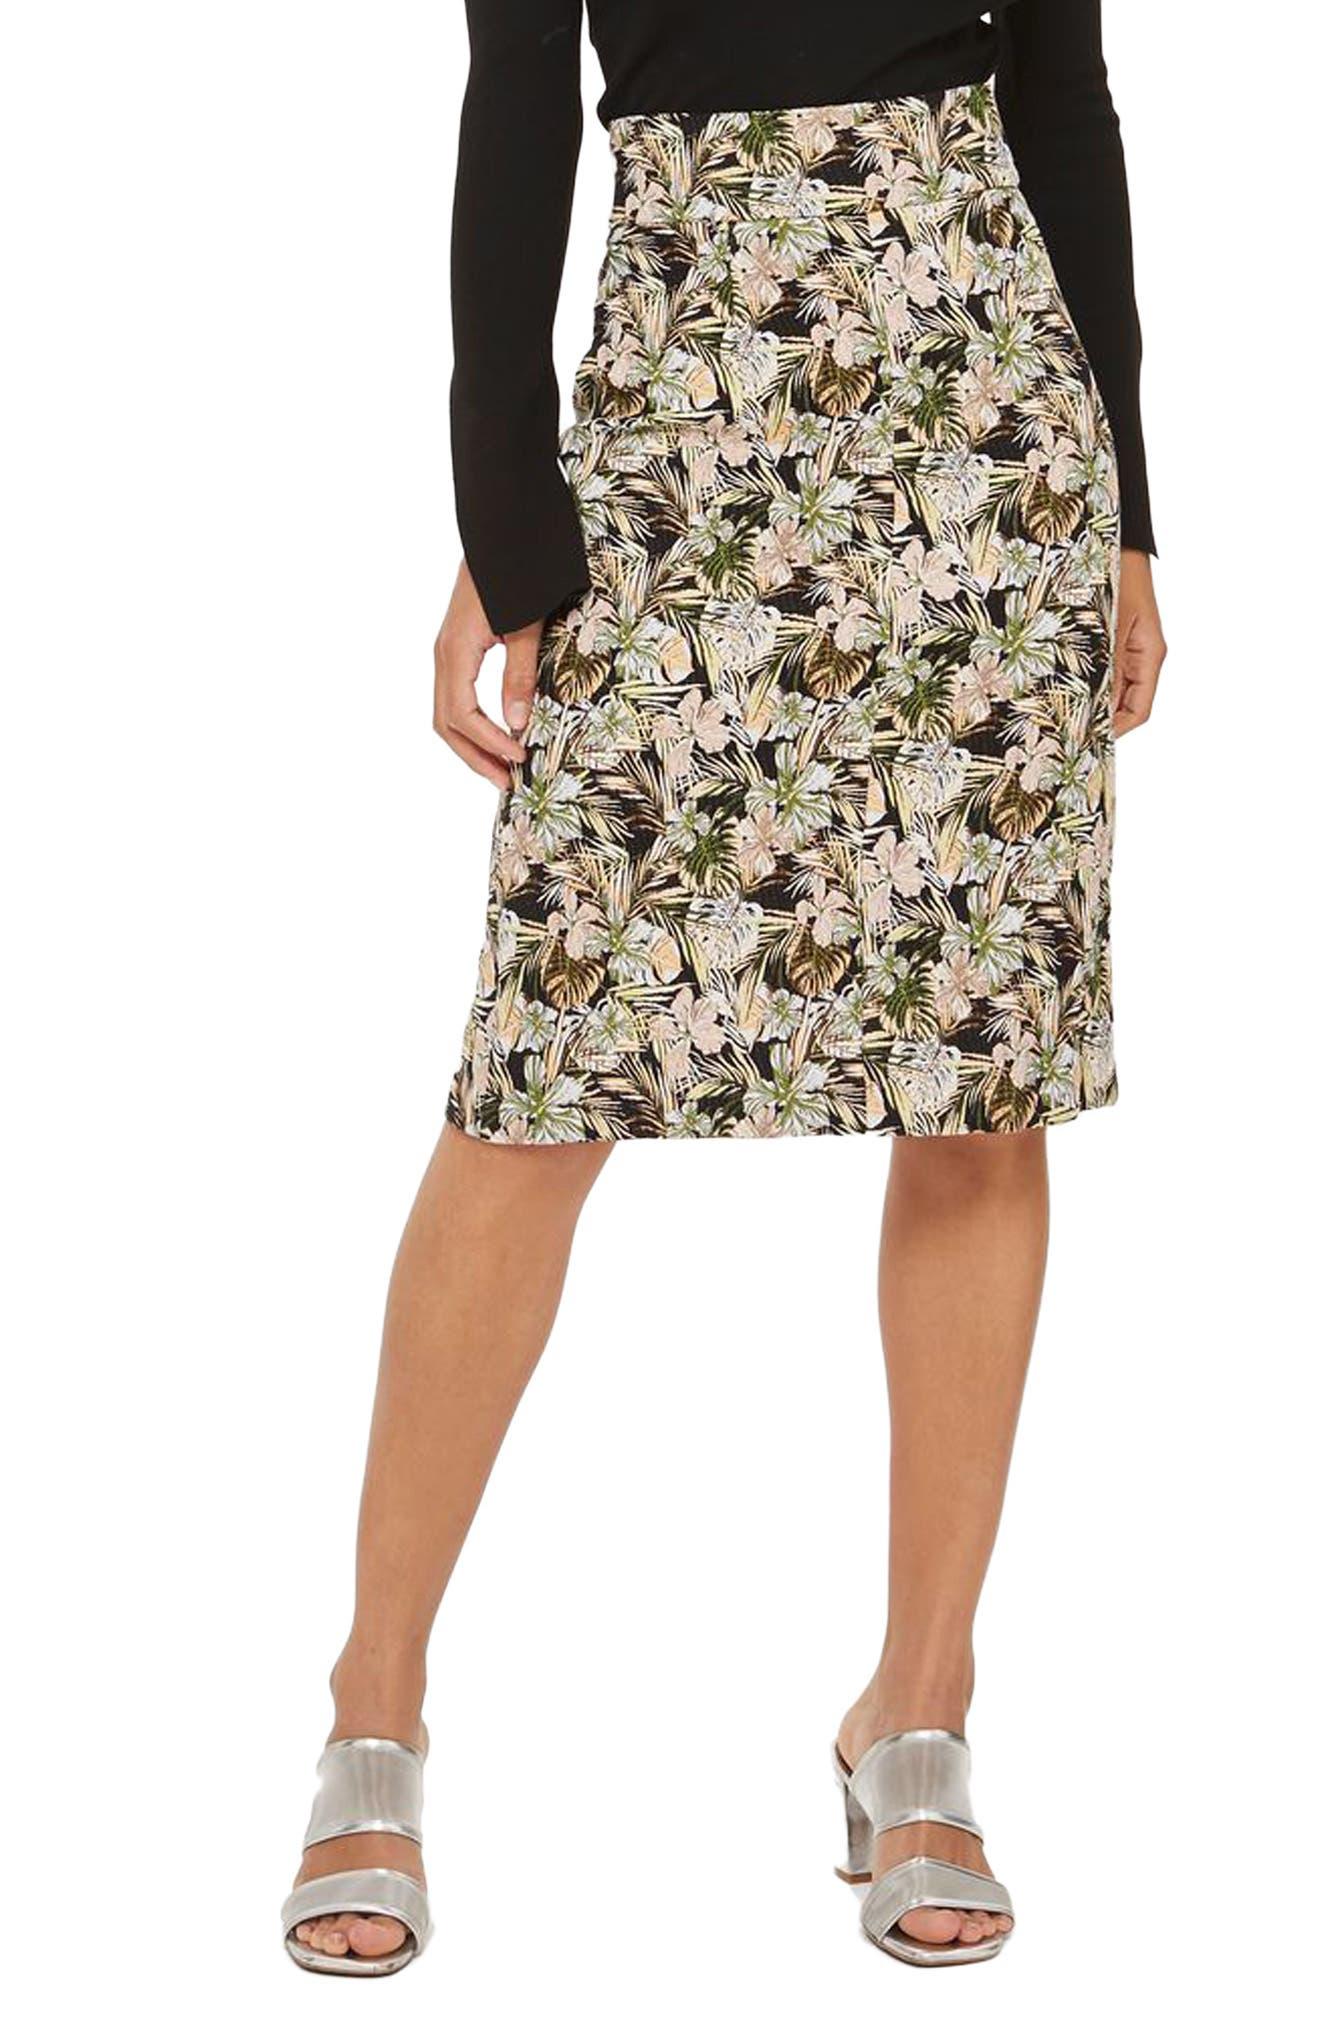 Topshop Floral Palm Print Pencil Skirt